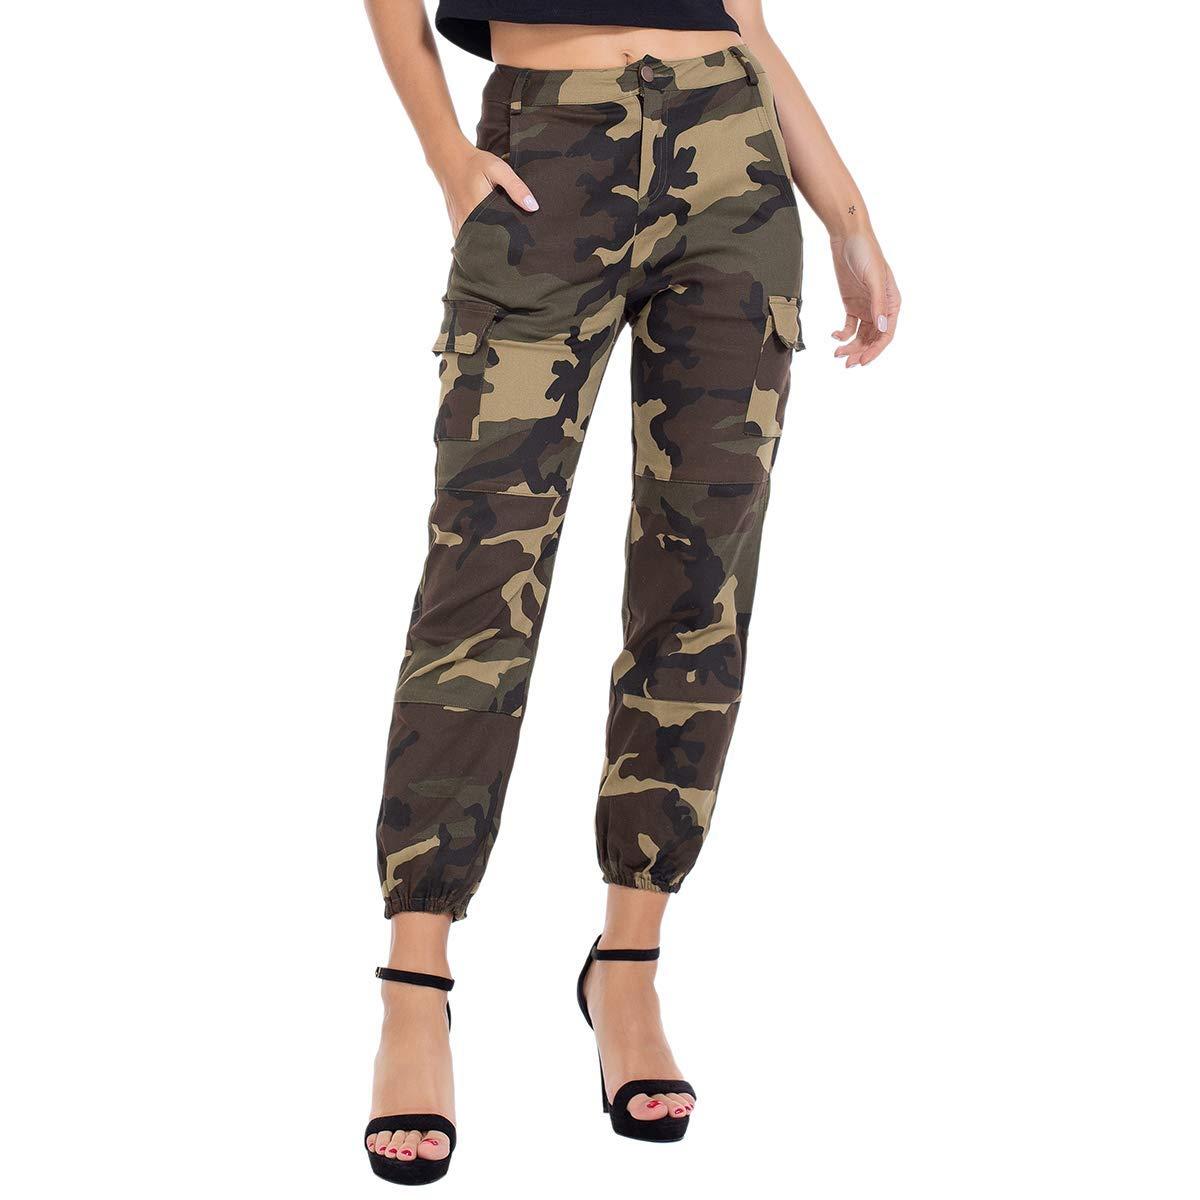 ec38b52842cfa RUEWEY Women High Waist Hip Hop Dance Tapered Cargo Jogger Pants Trousers  Harem Baggy Jogging Sweatpants at Amazon Women's Clothing store: